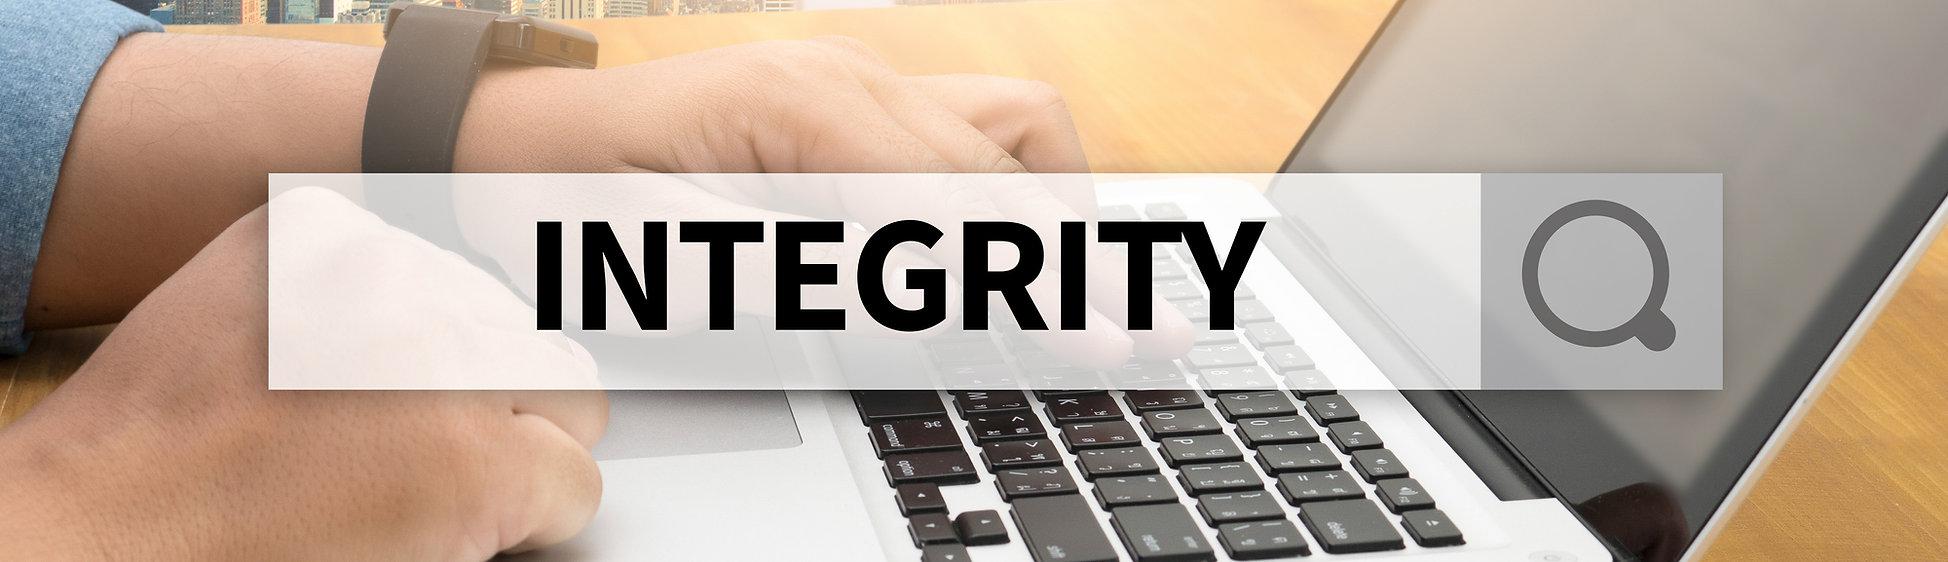 INTEGRITY   Ethics Loyalty Moral Motivat